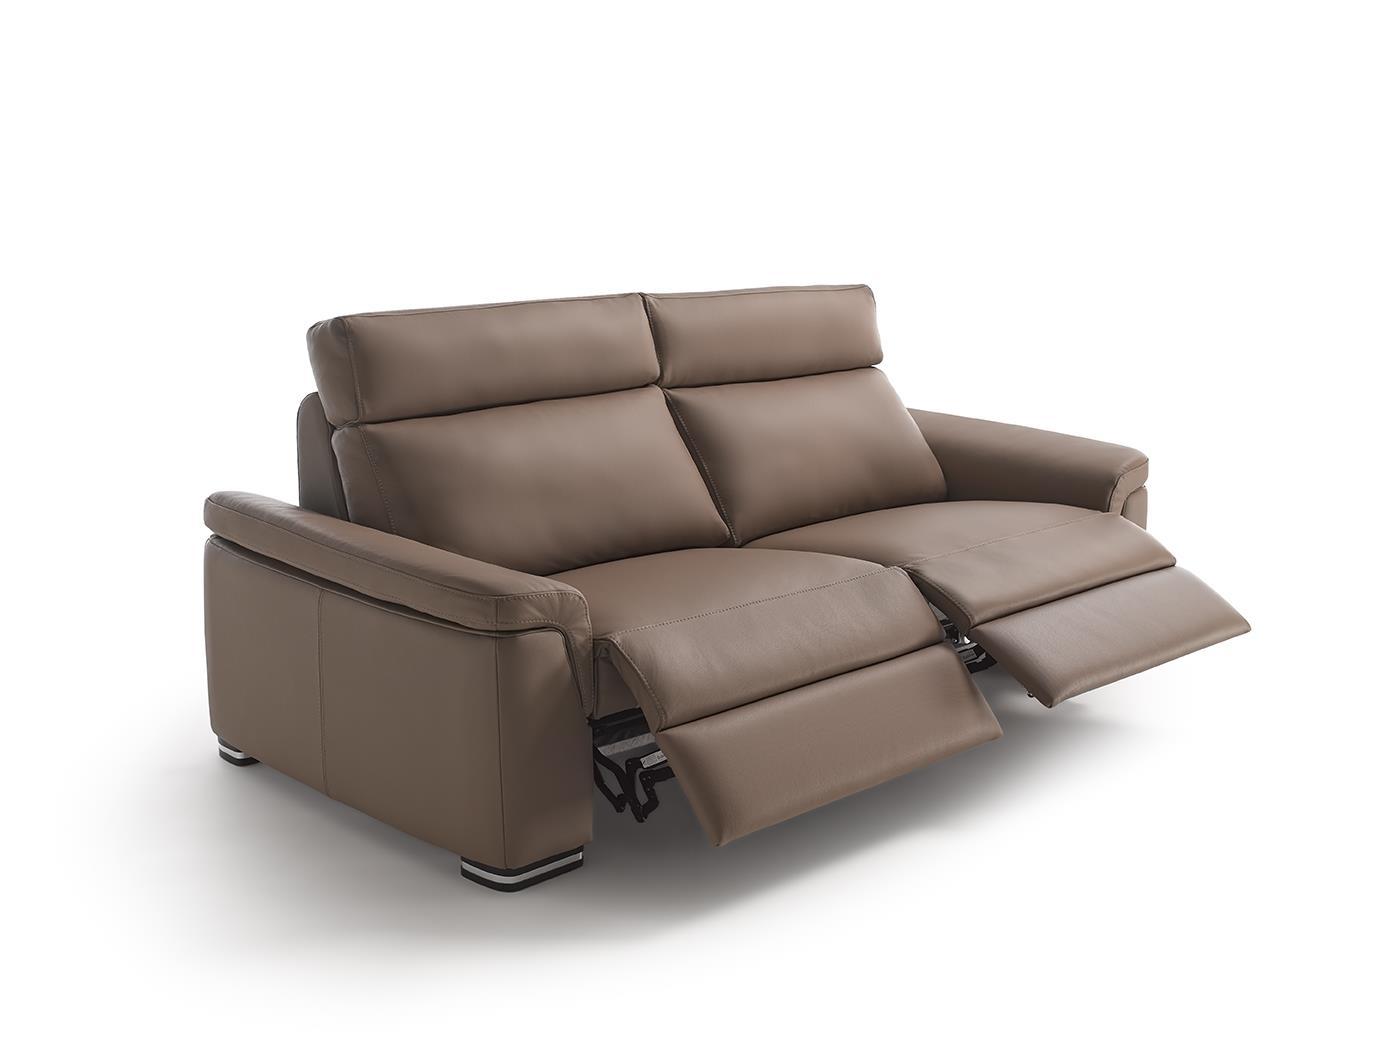 GALA 198 Fabric 3  Seater Reclining Sofa.